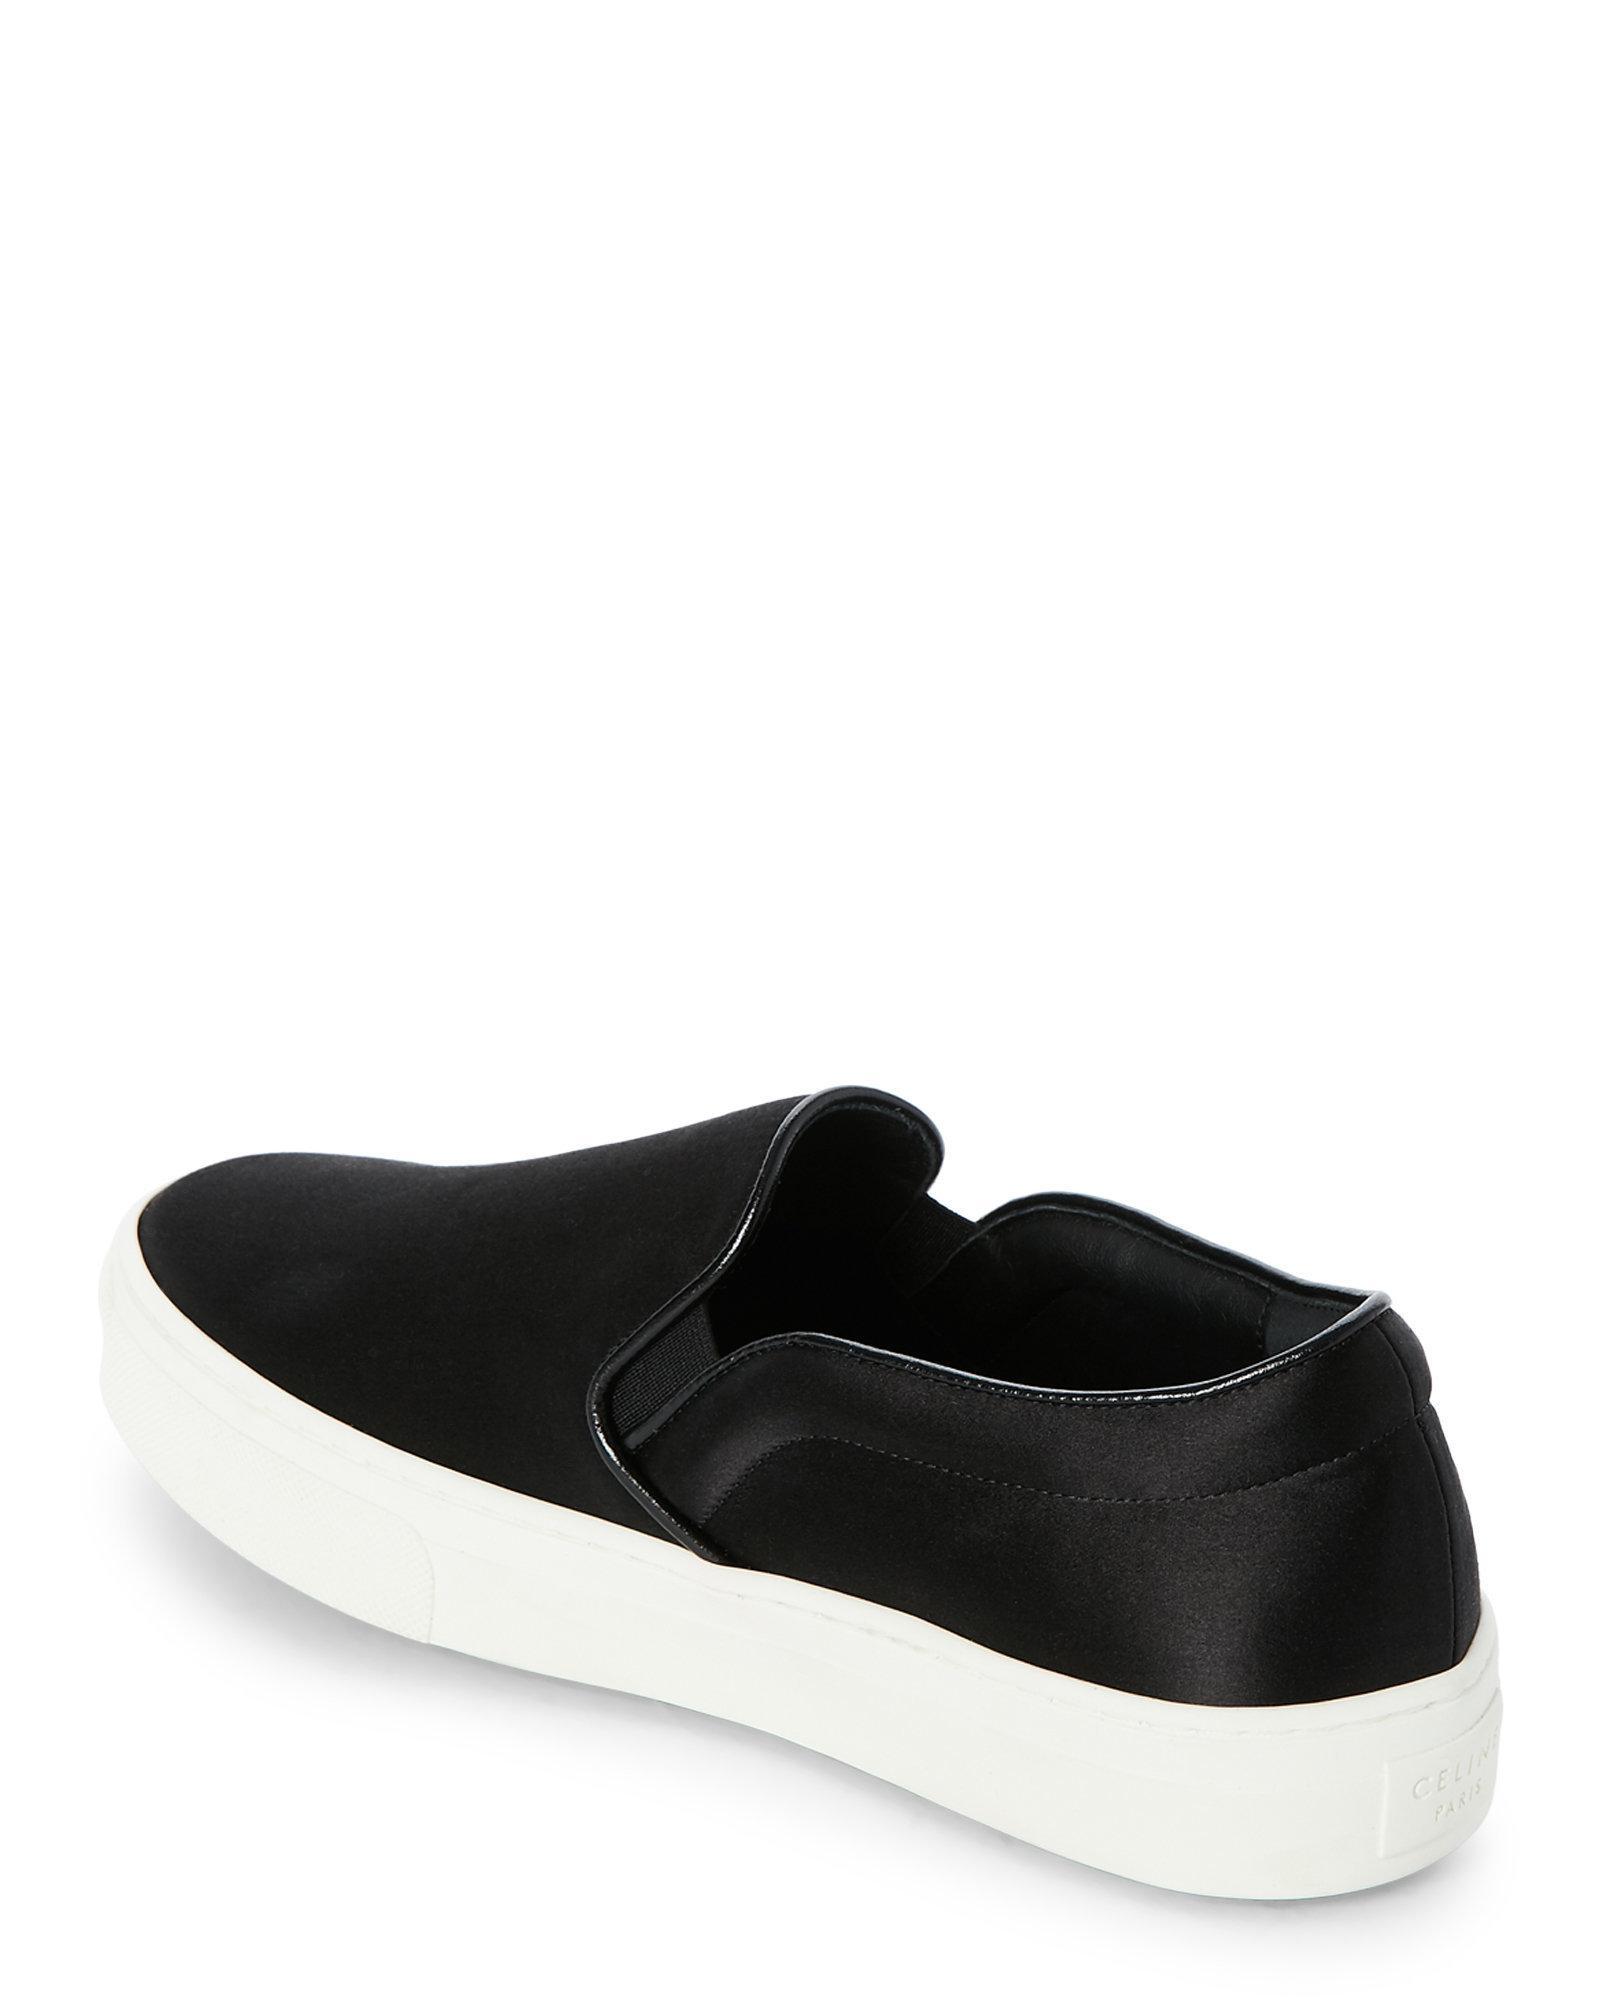 bbfc47c4d379 Lyst - Céline Black Satin Platform Slip On Sneakers in Black for Men